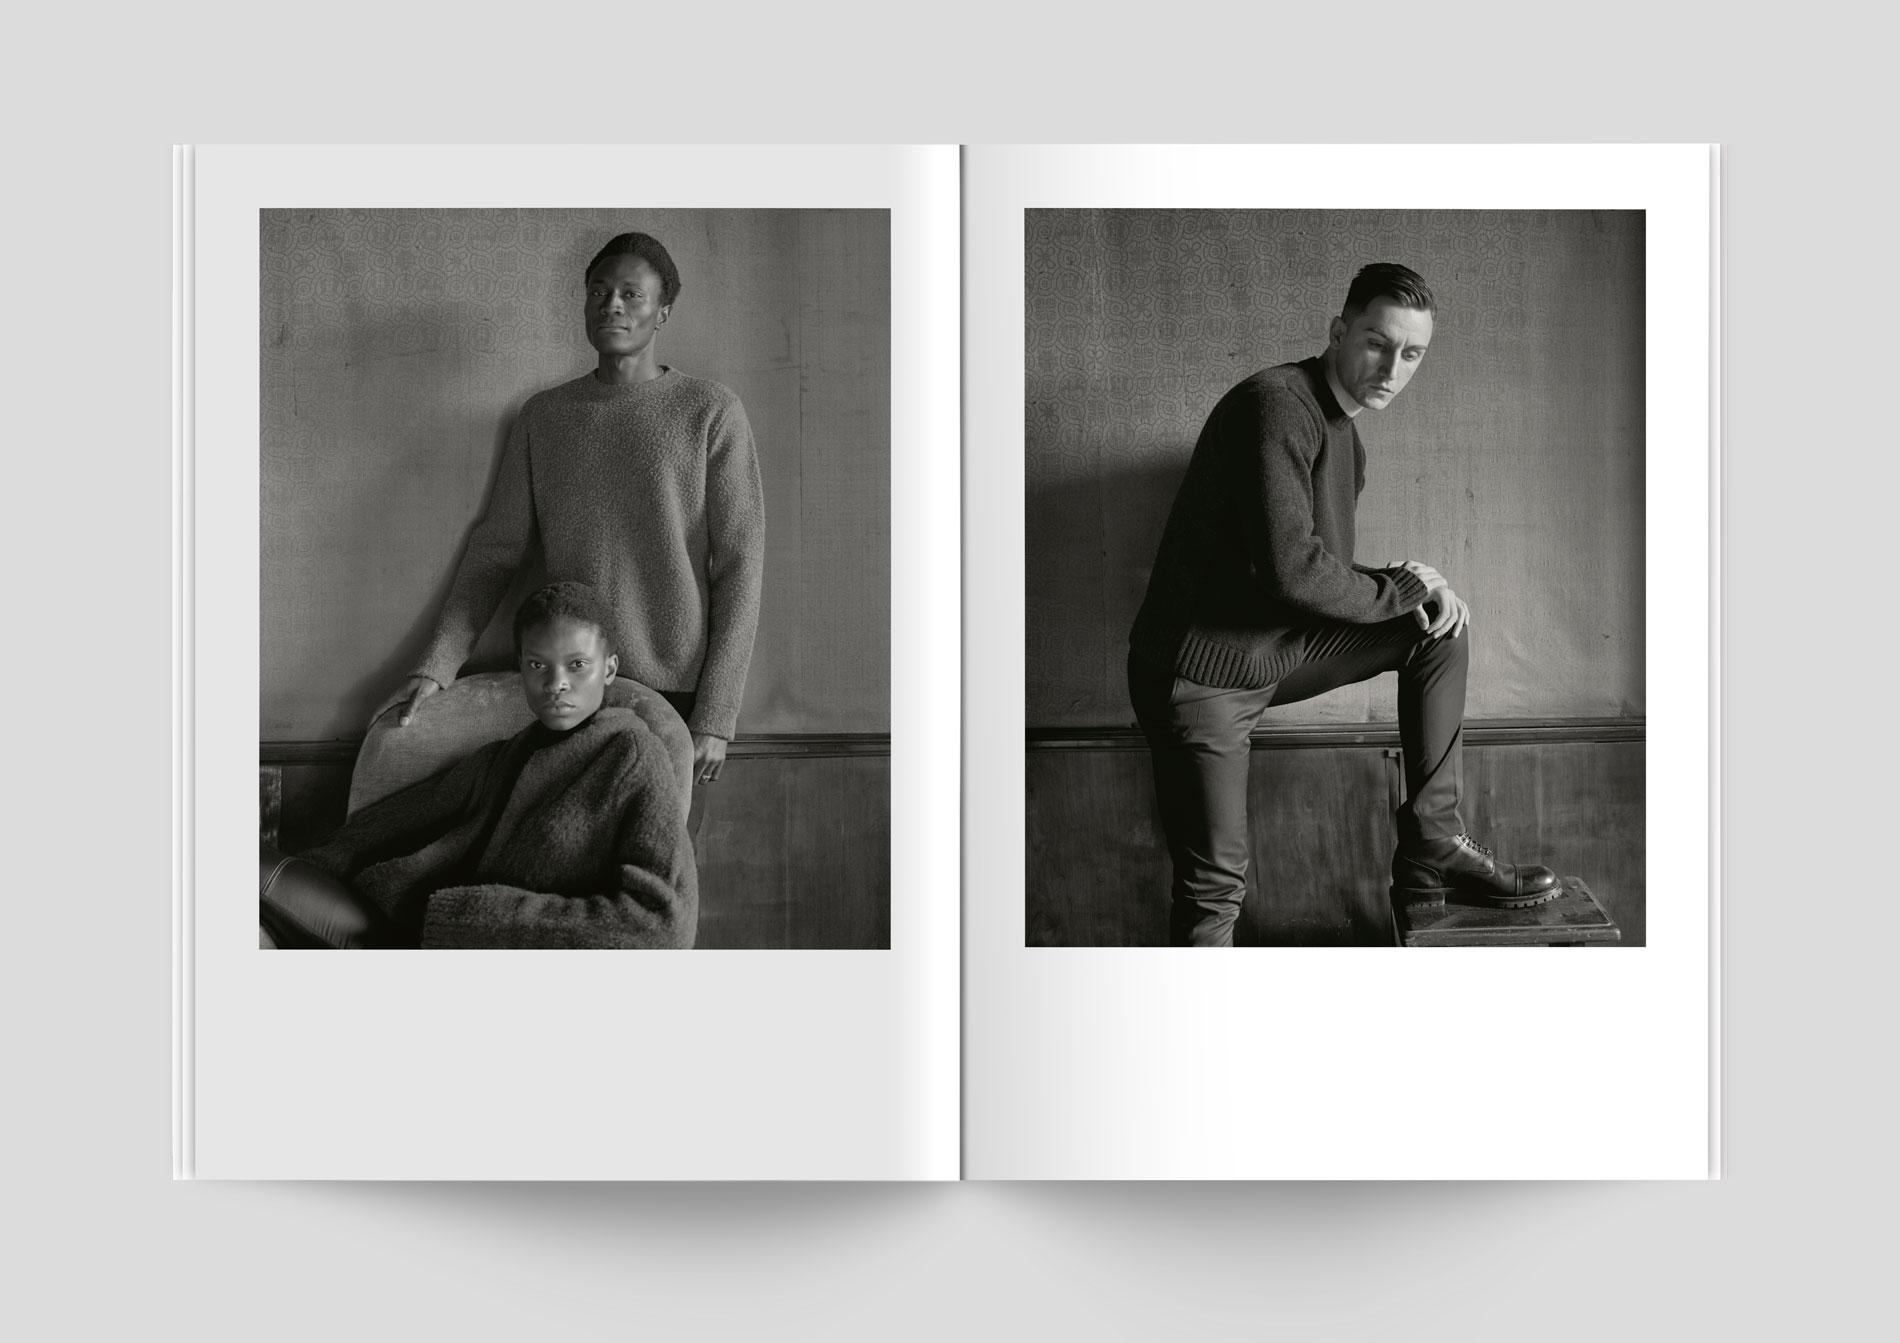 Santoni-Edited-by-Marco-Zanini-Ingar-Krauss-11